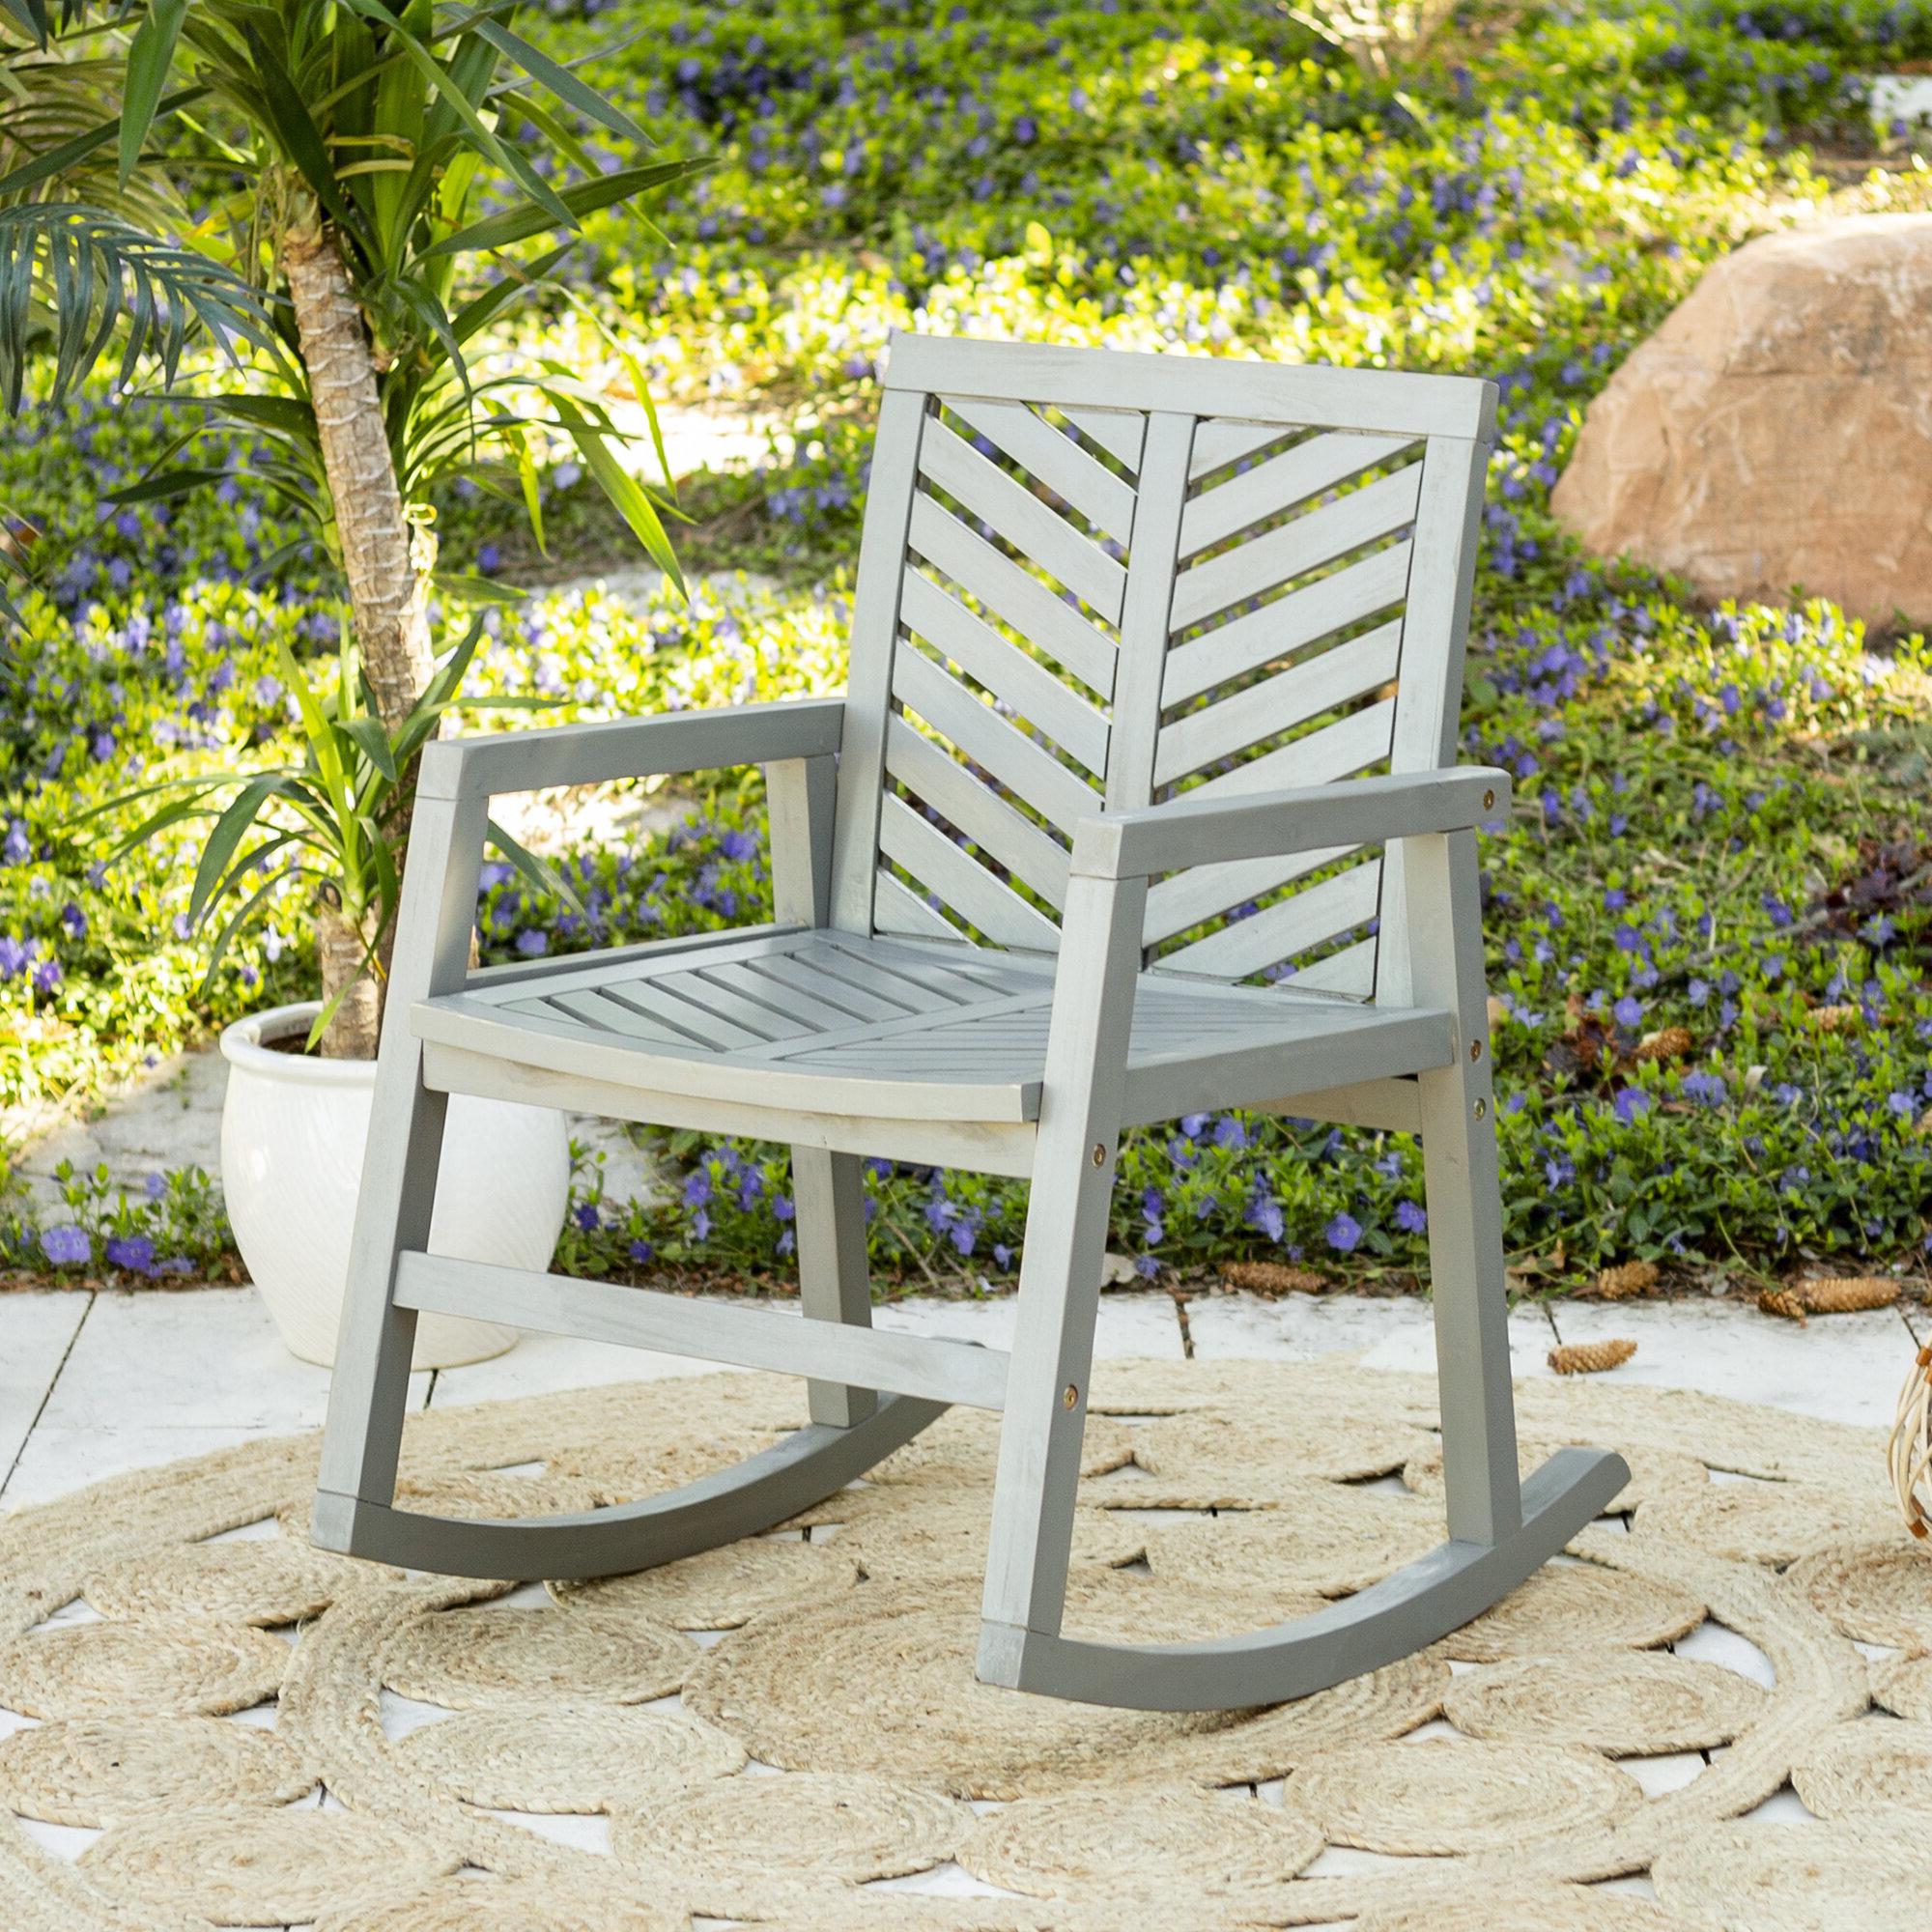 Skoog Chevron Wooden Garden Benches With Most Popular Skoog Outdoor Chevron Rocking Chair (View 15 of 30)